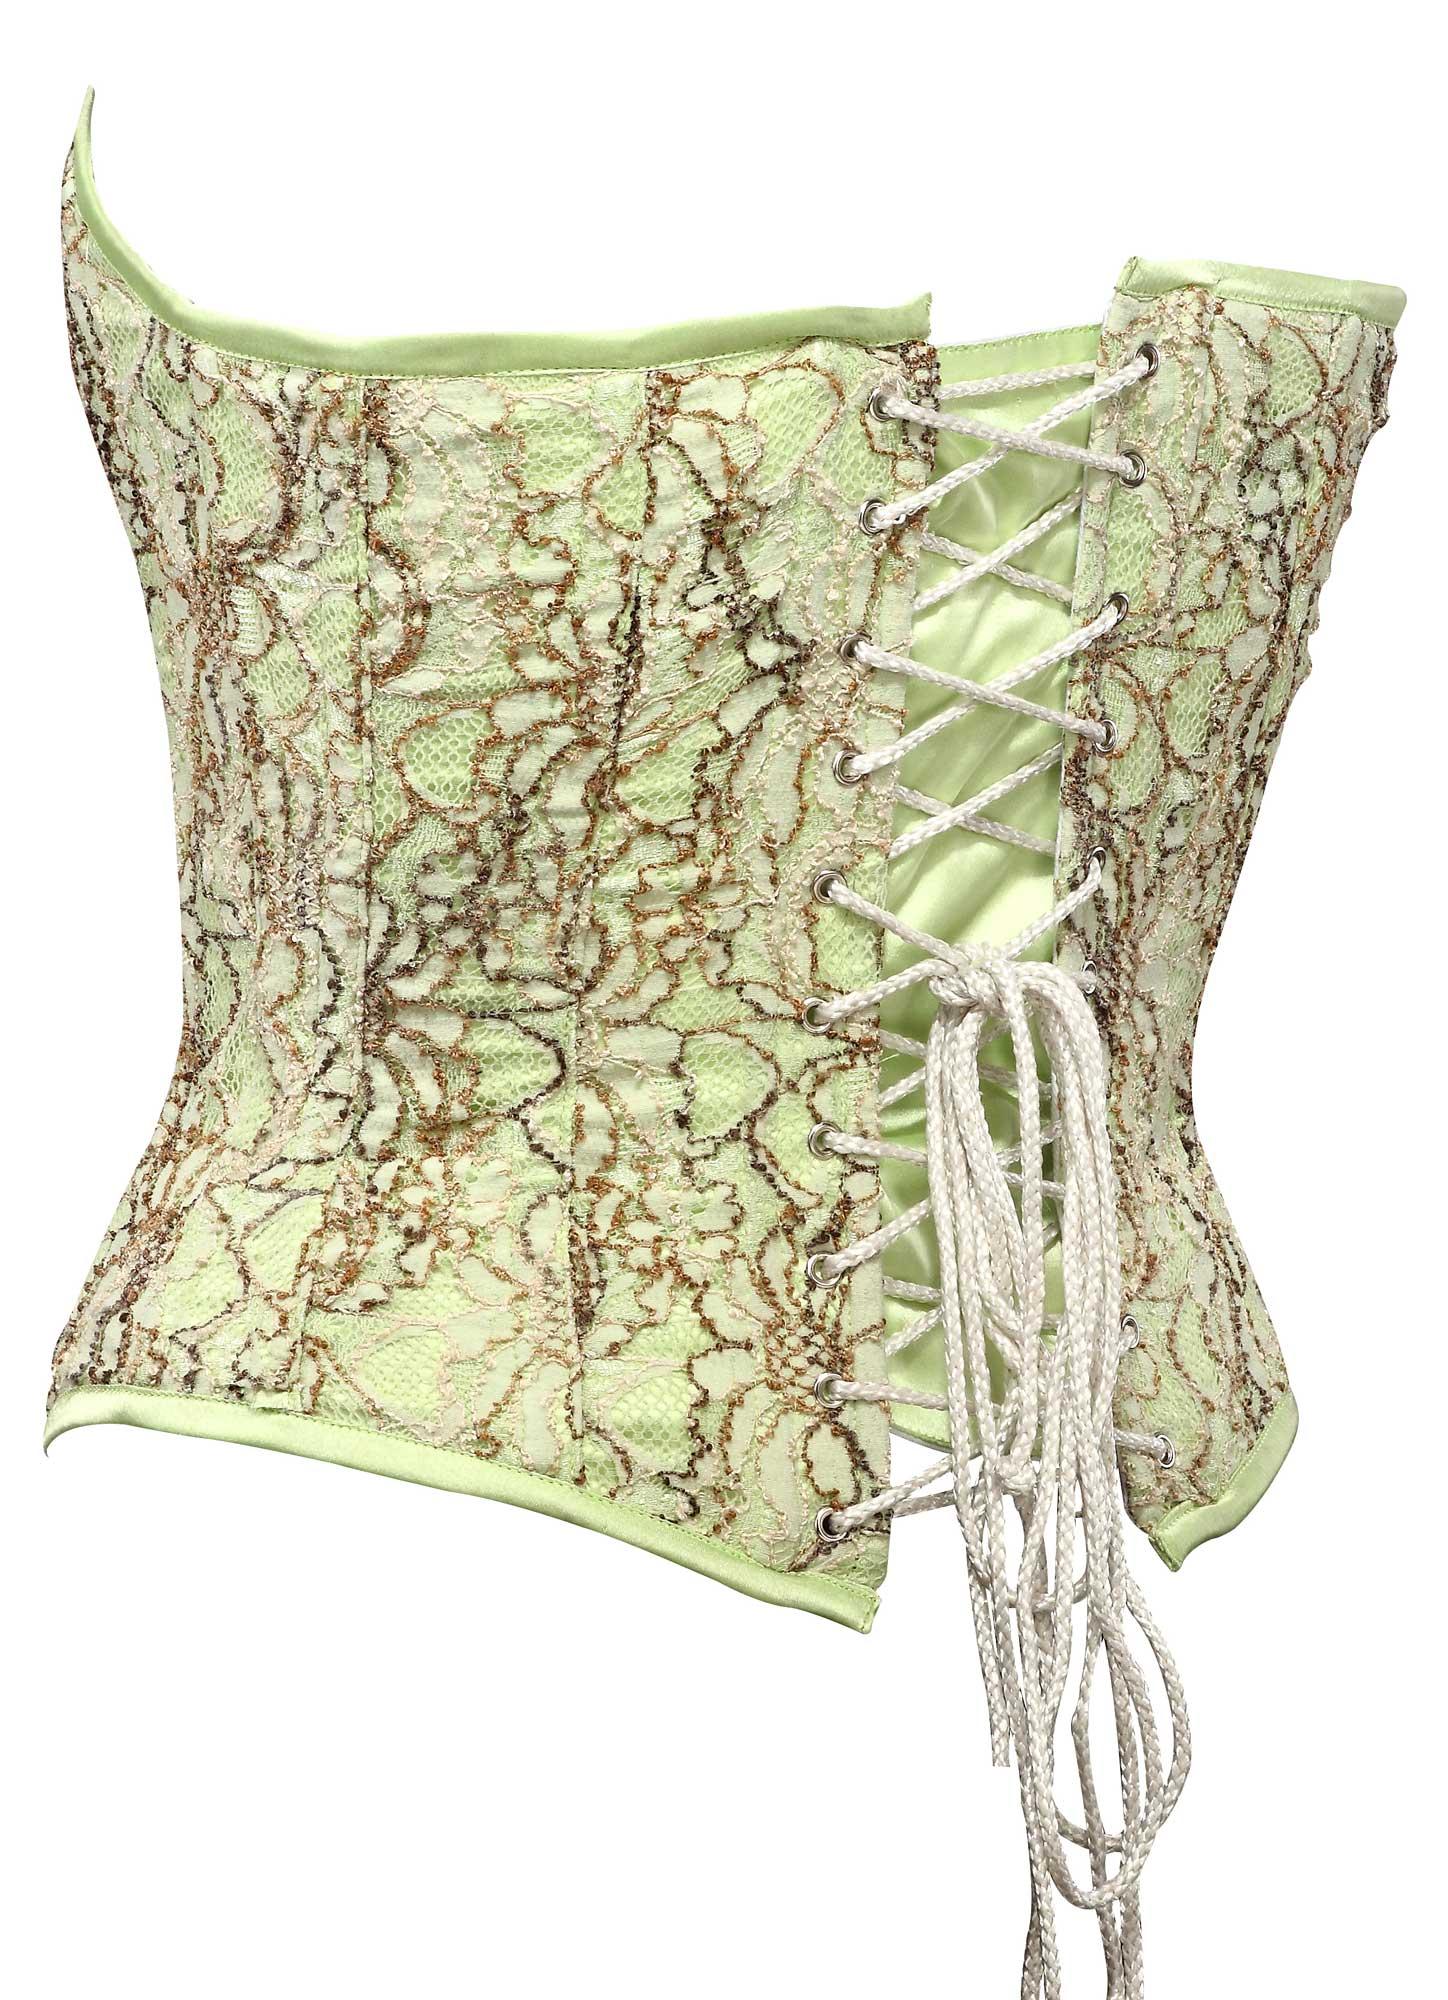 floral_net_fabric_steel_boning_corset_waist_cincher_bustier_bustiers_and_corsets_3.jpg